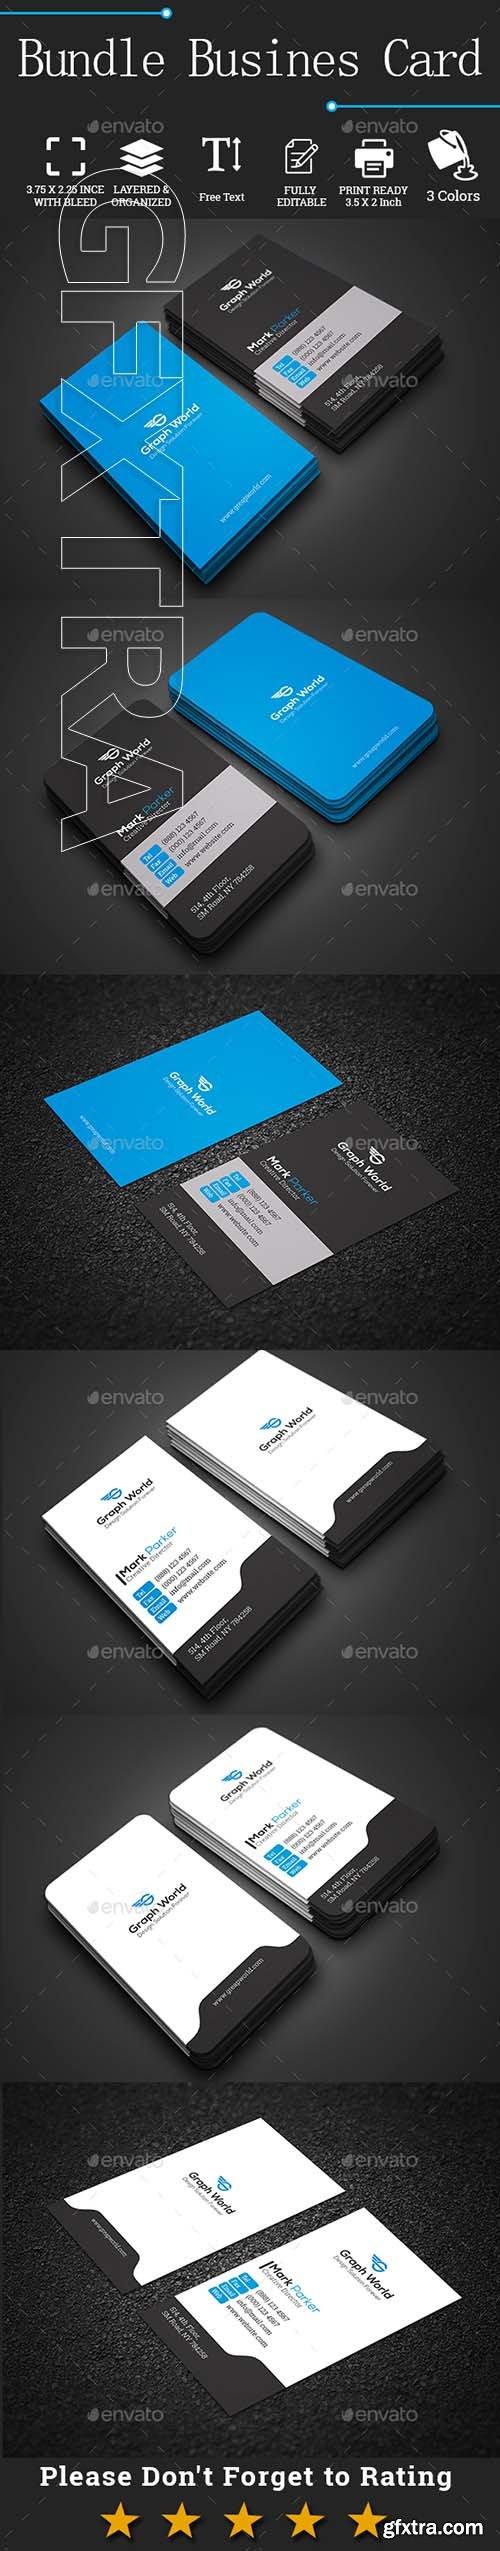 GraphicRiver - Bundle Business Cards 22135515